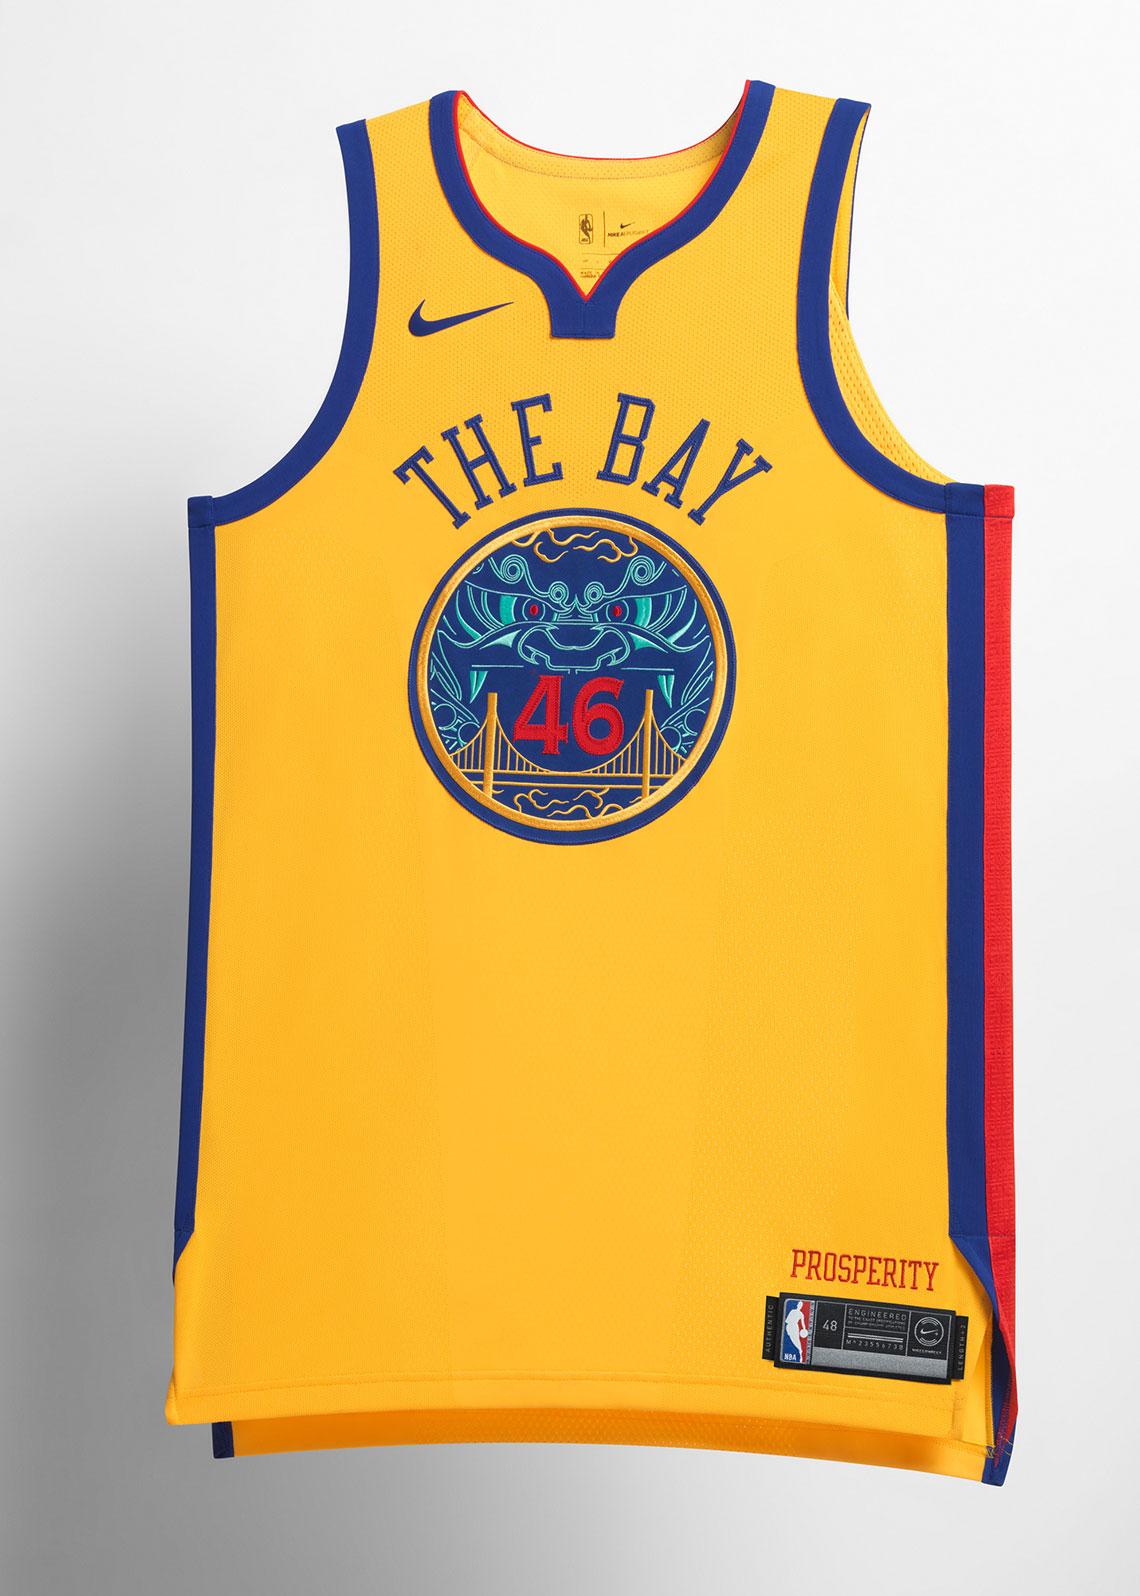 the latest 0b1fb c7cc7 Nike NBA City Edition Uniforms | SneakerNews.com